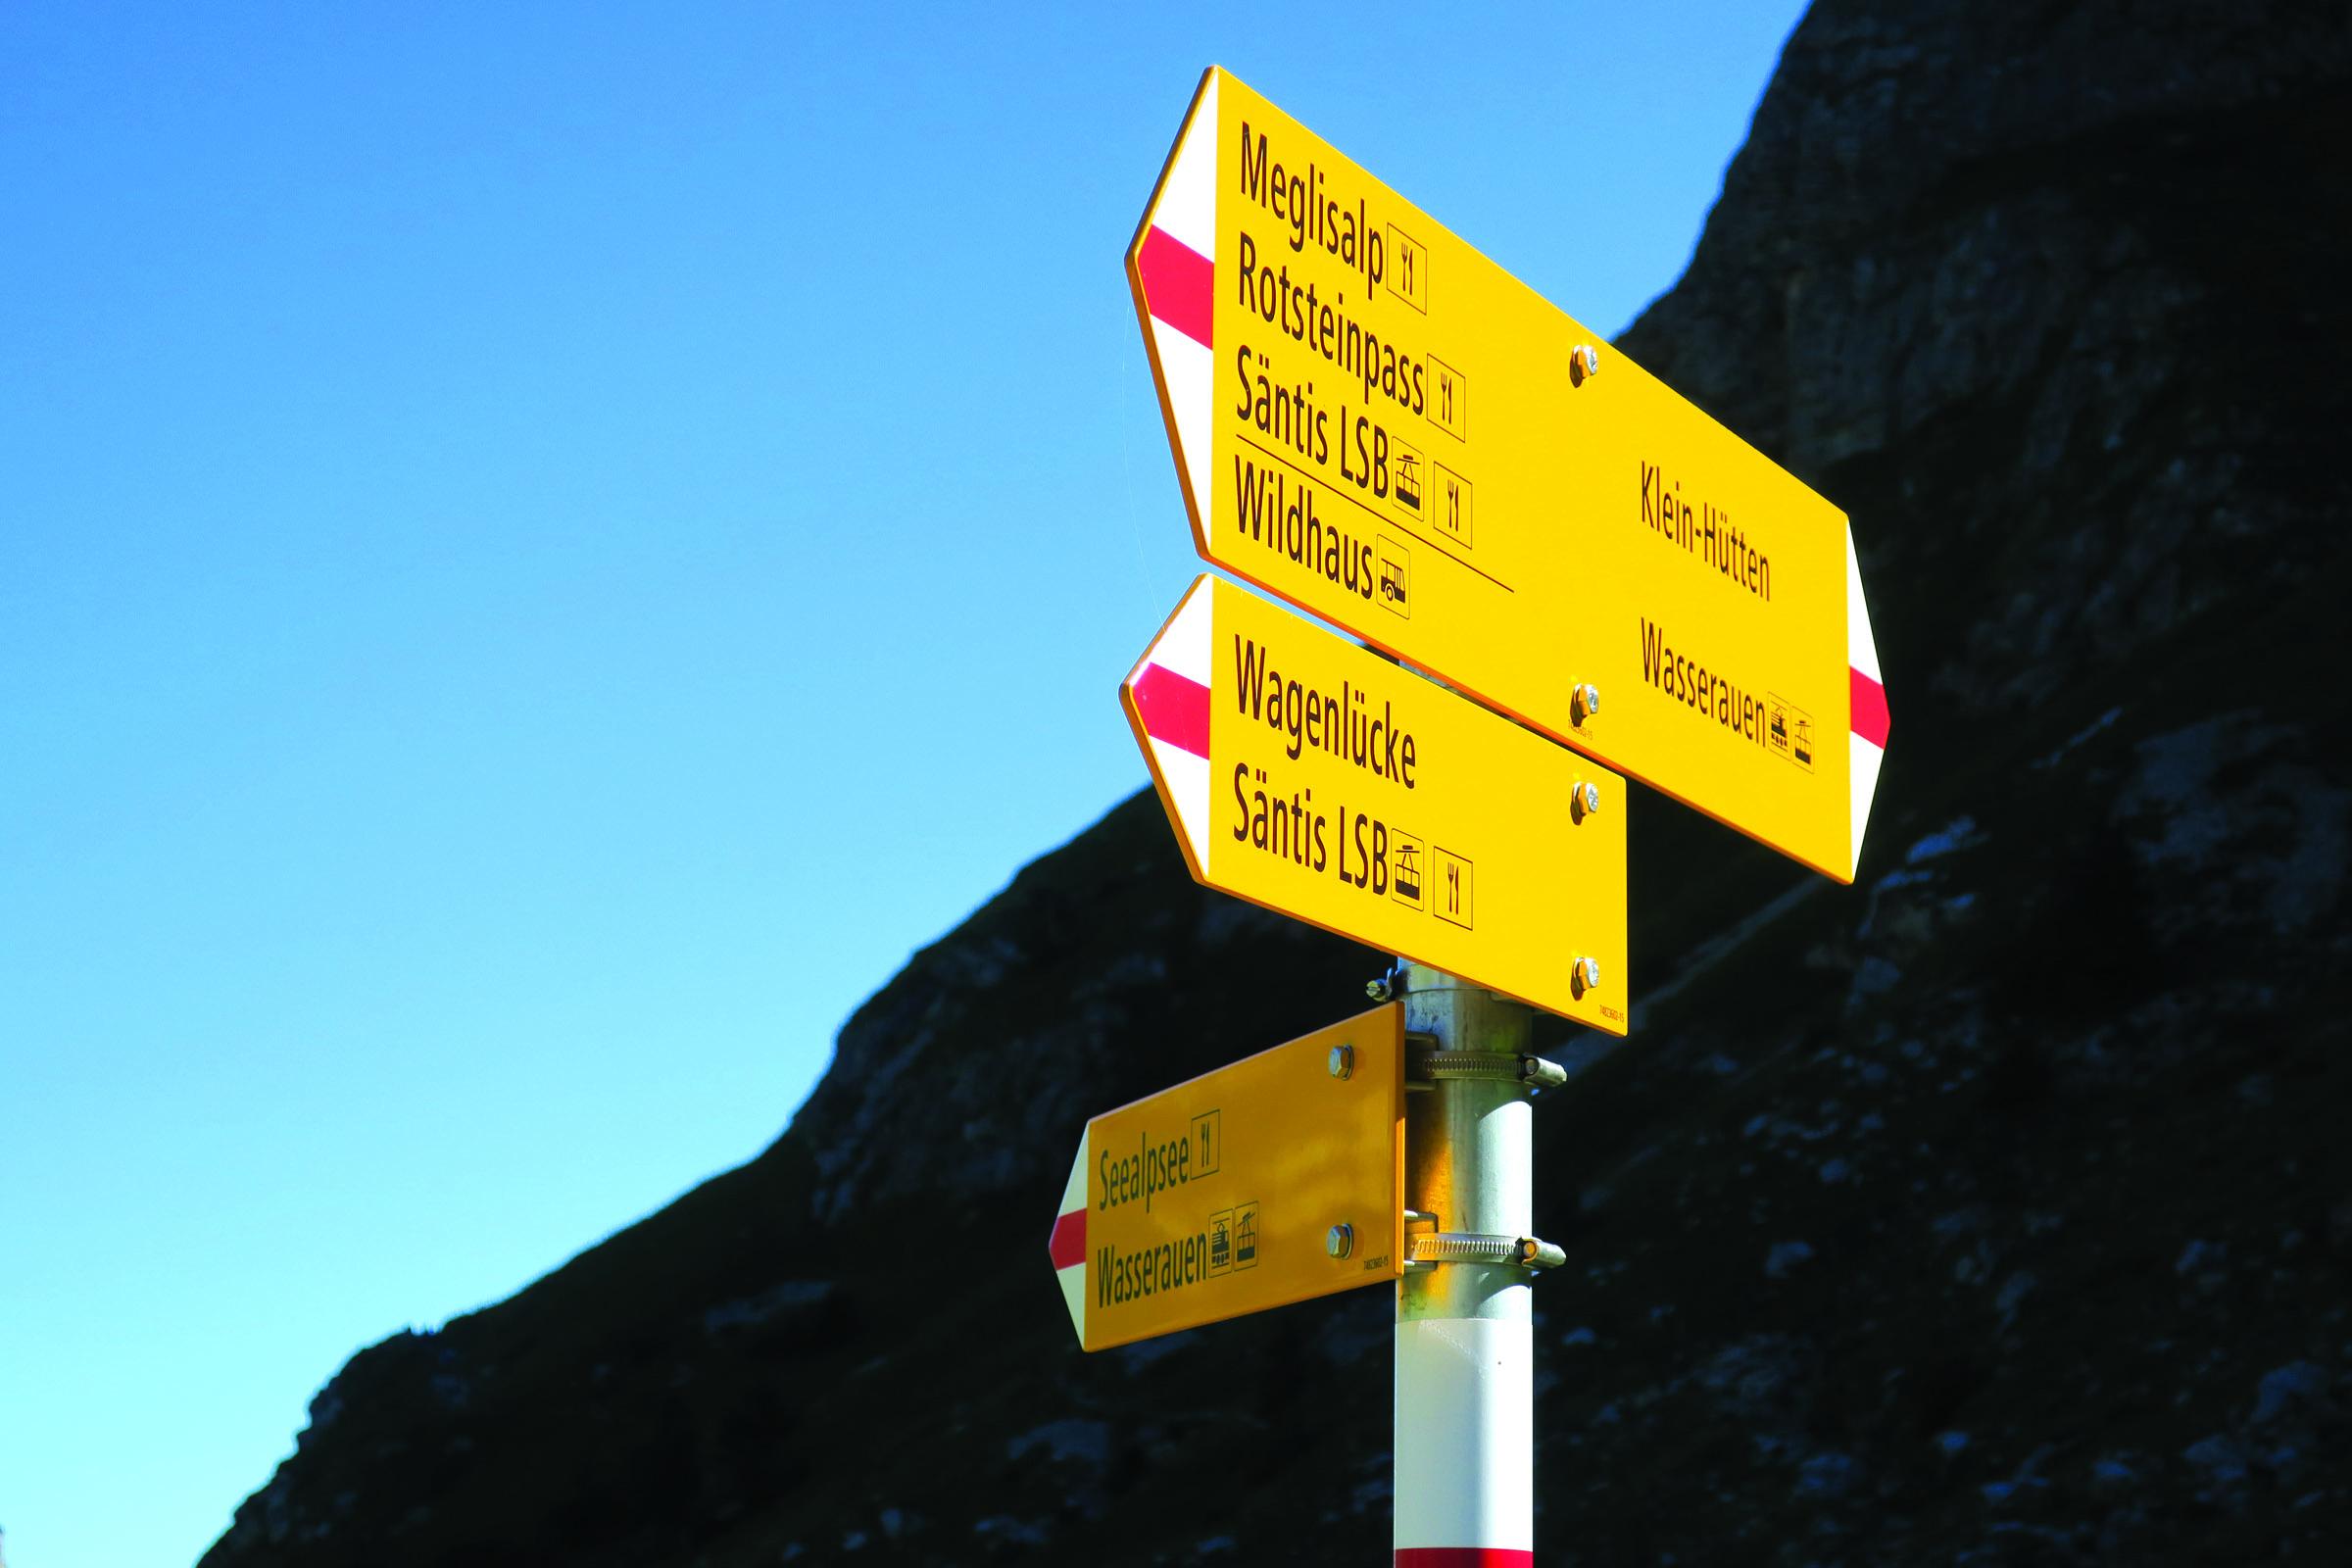 The abundant signage makes for safe and efficient travels